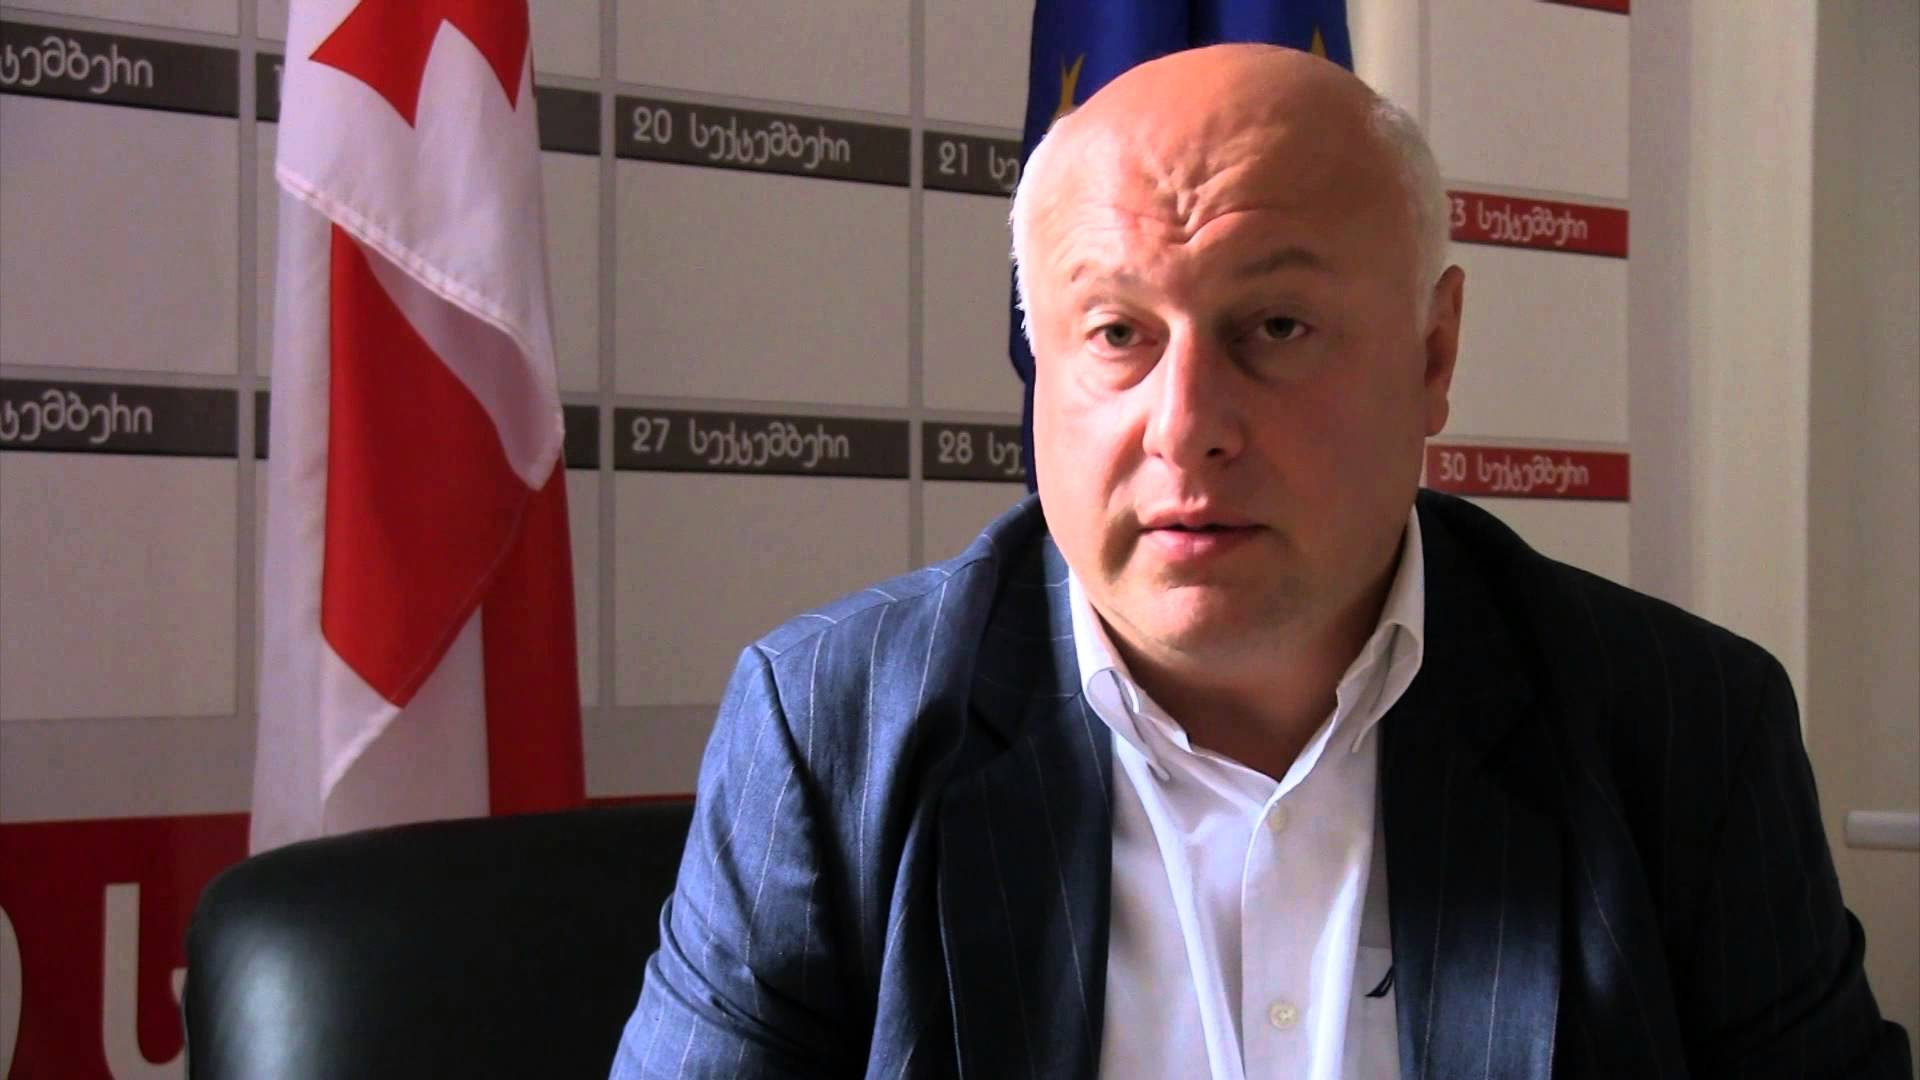 Делегация России поддержит кандидатуру Церетели на пост президента ПА ОБСЕ